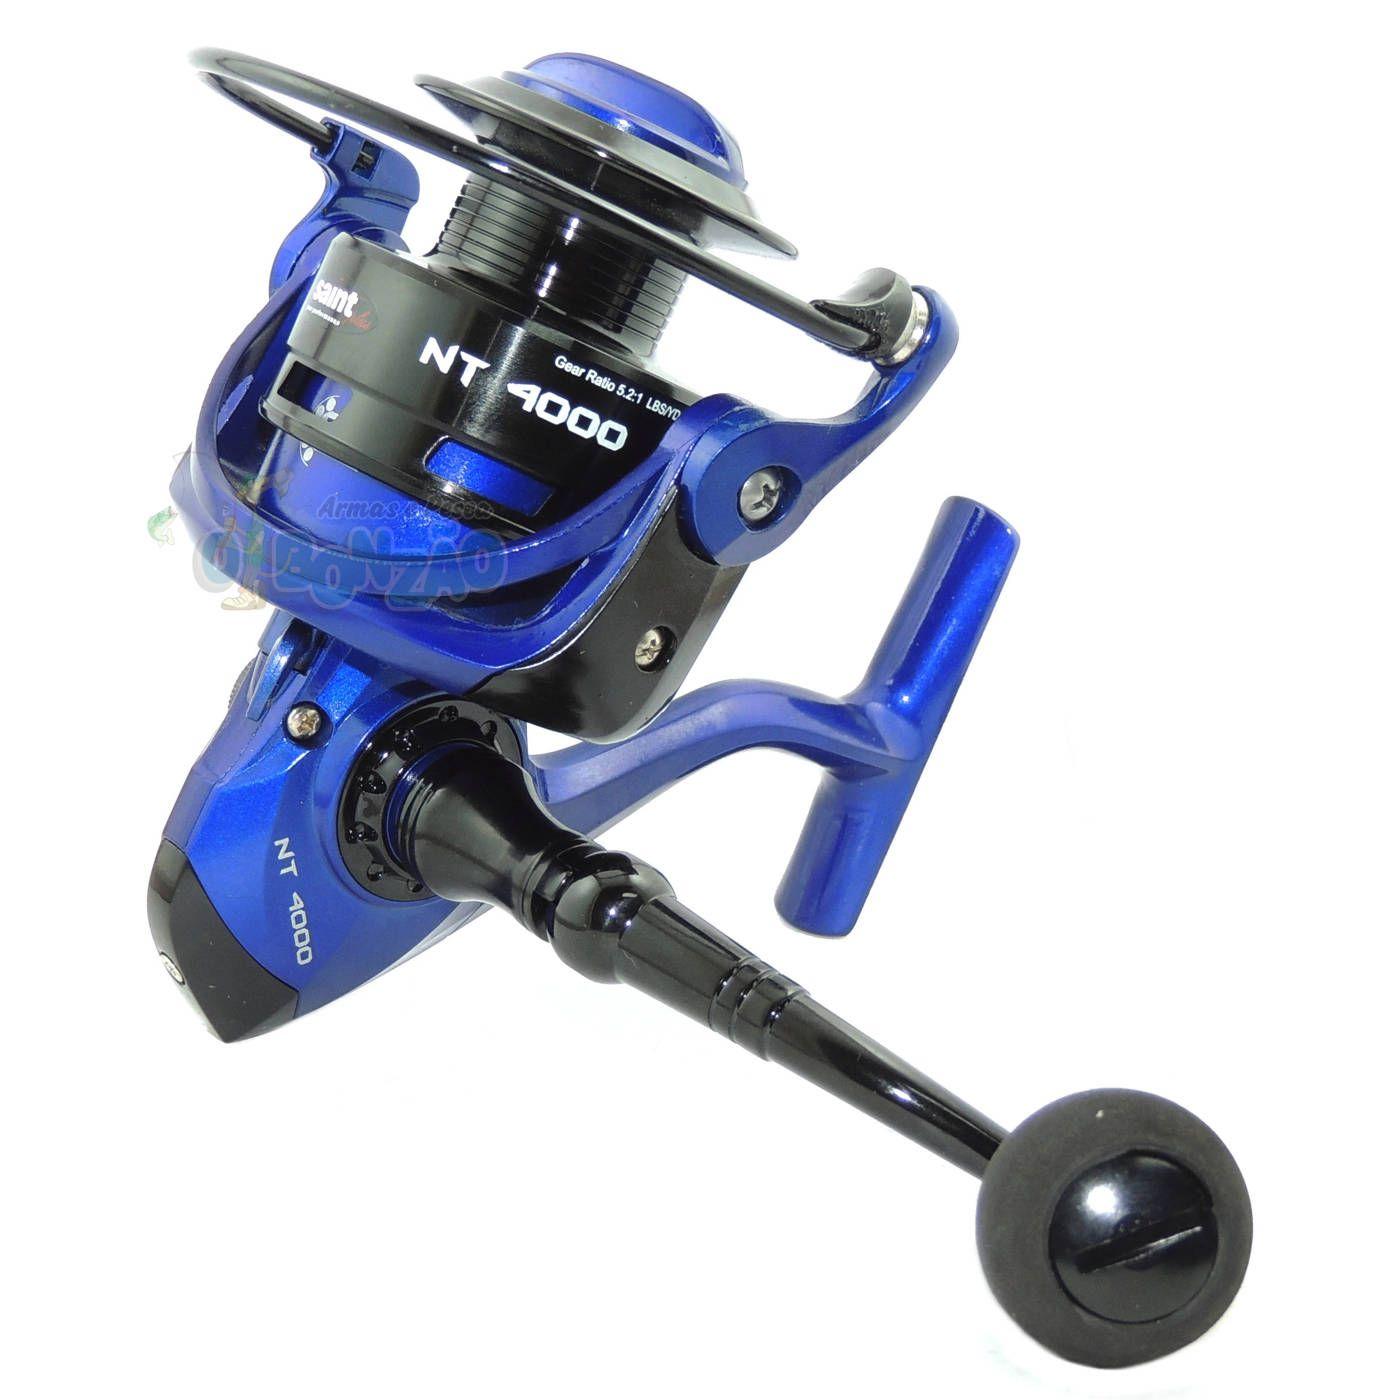 Molinete Saint Plus Netuno 4000 Azul FD